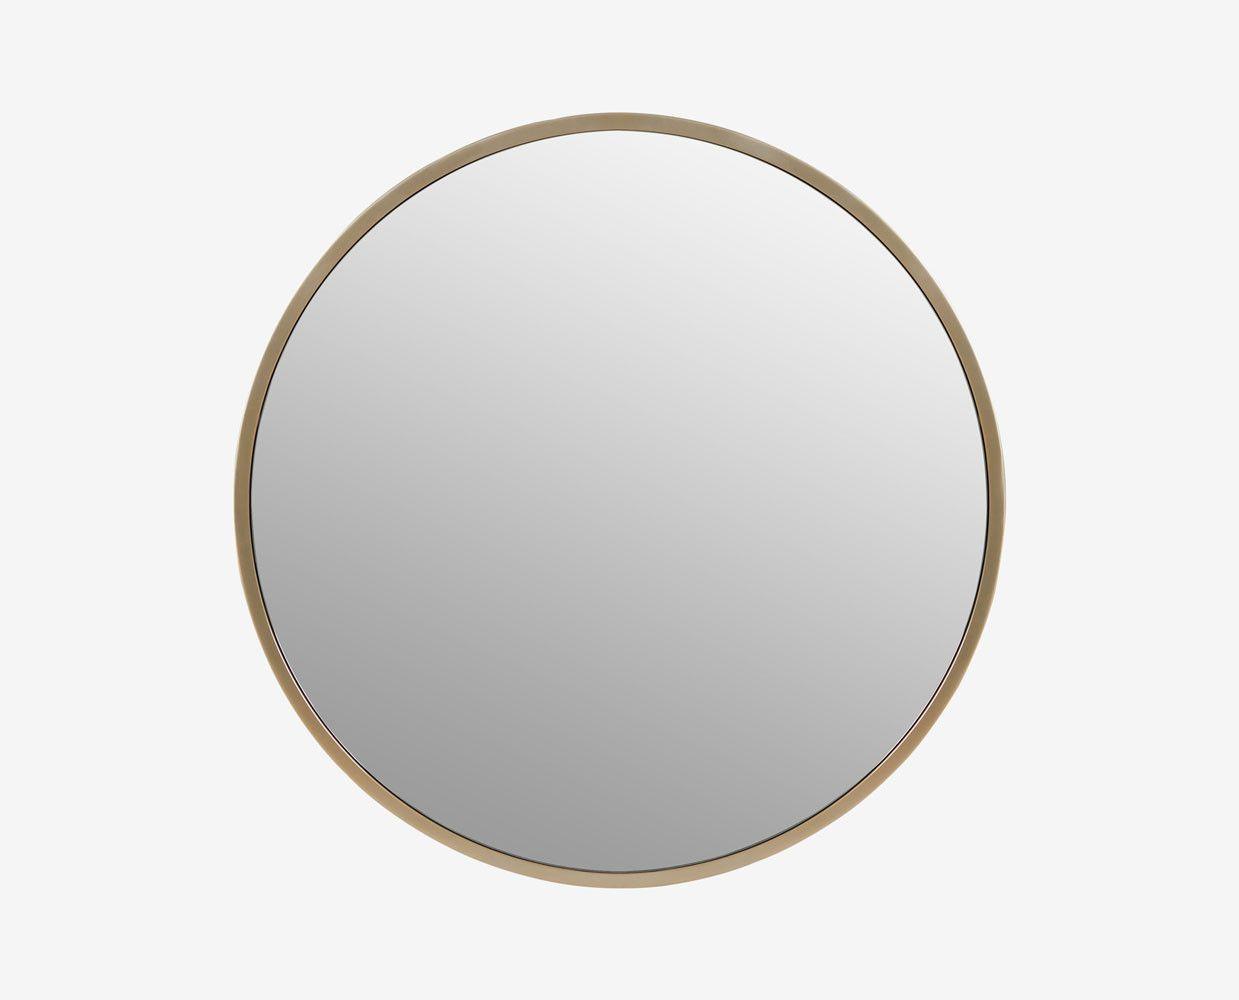 48 round mirror 28 inch maia 48 magical mirrors pinterest round mirrors rounding and